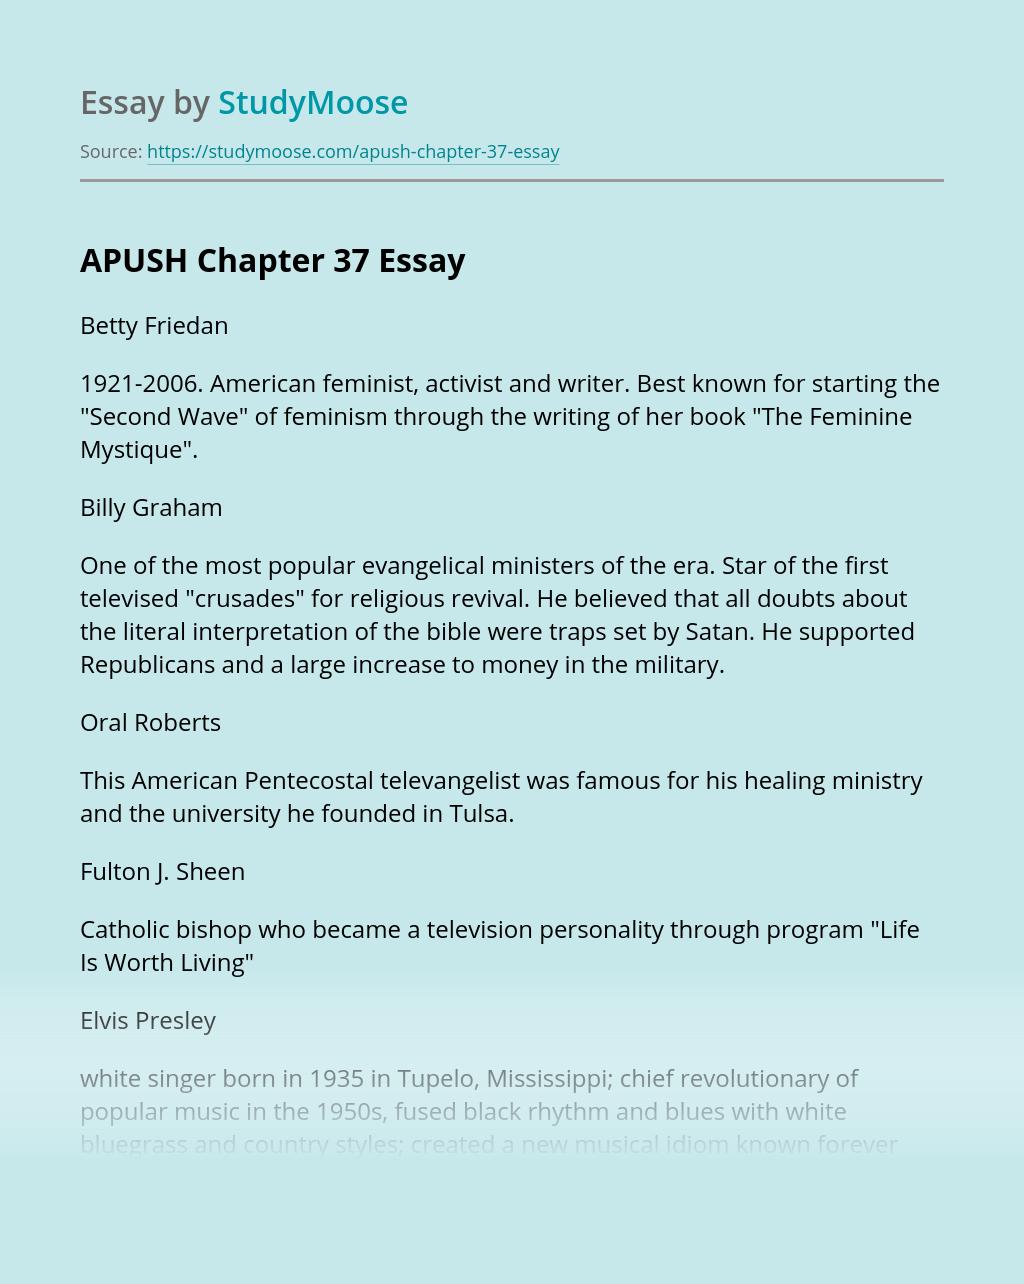 APUSH Chapter 37